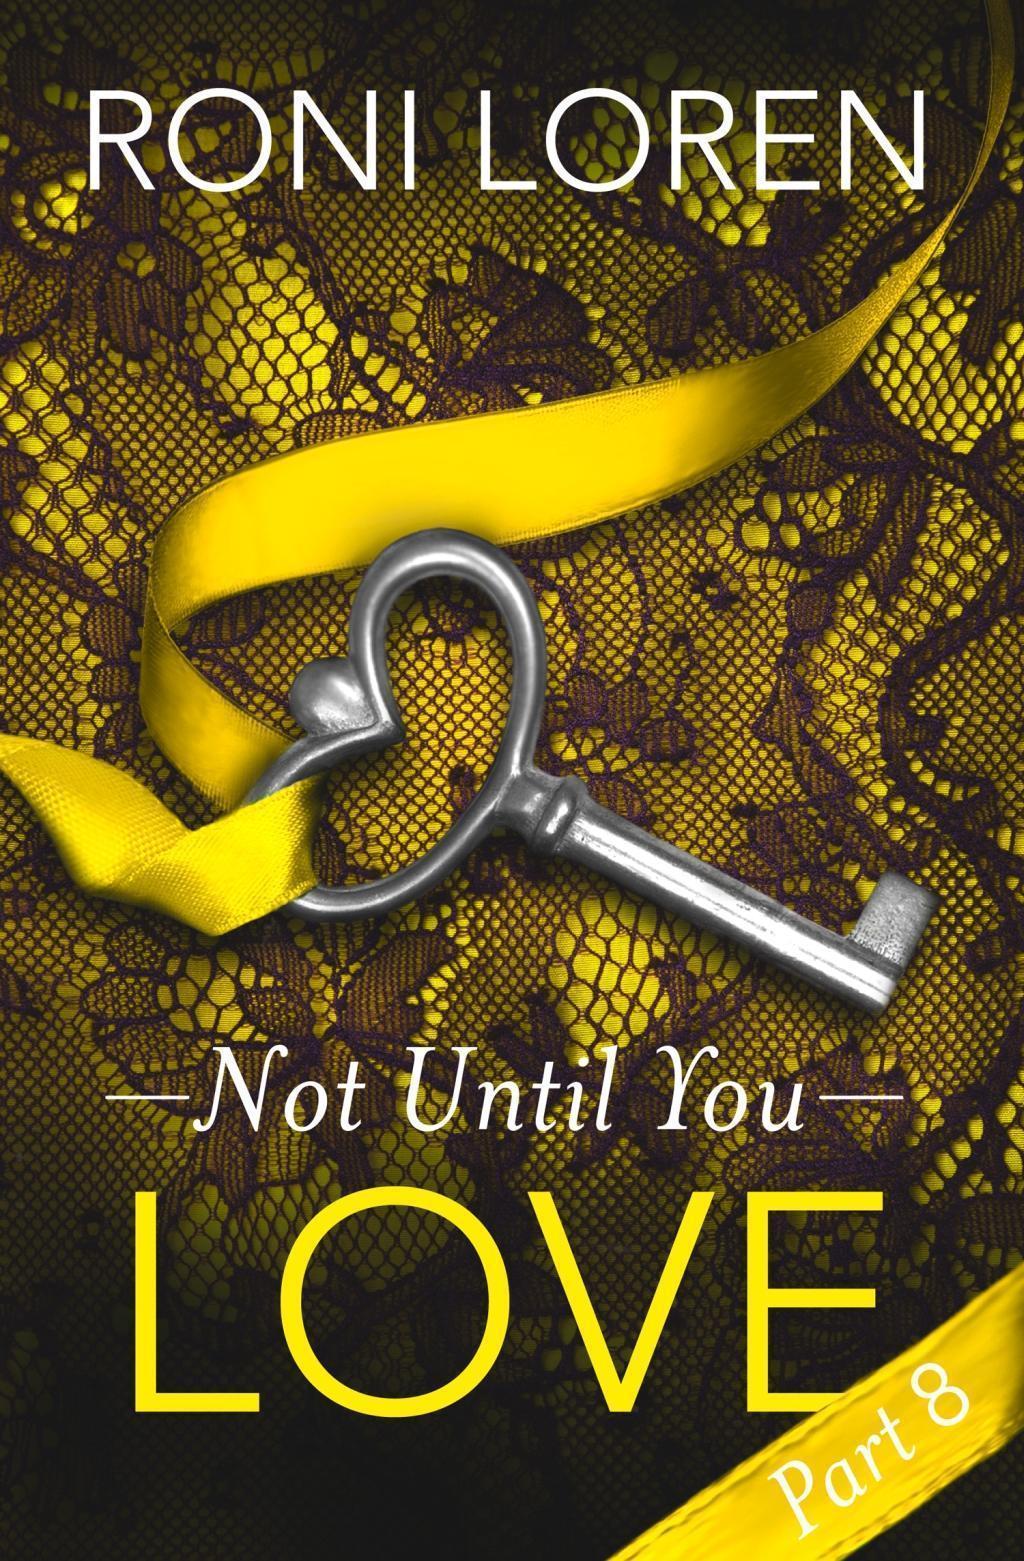 Love: Not Until You, Part 8